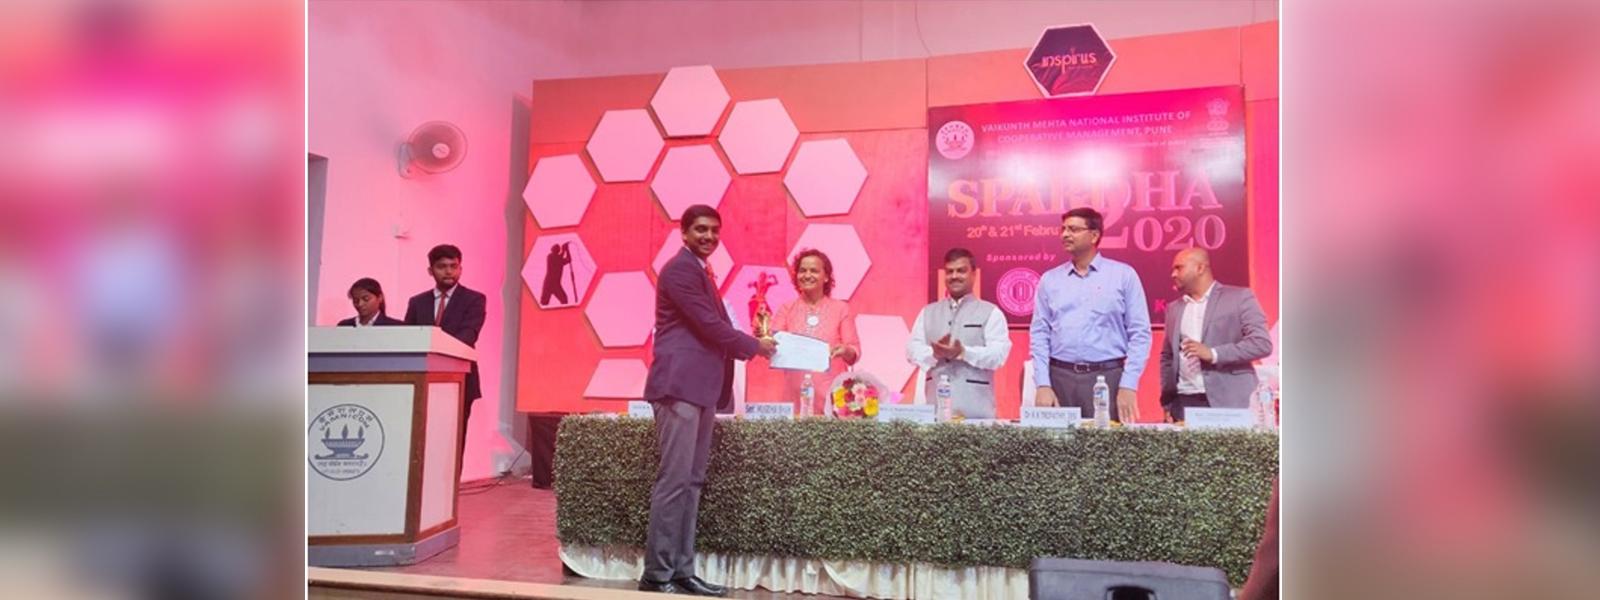 Aditya Vilas Dhurjad awared Best Manager Award ( Rank 3rd) at Vamnicom, 21st to 22nd February, 2020